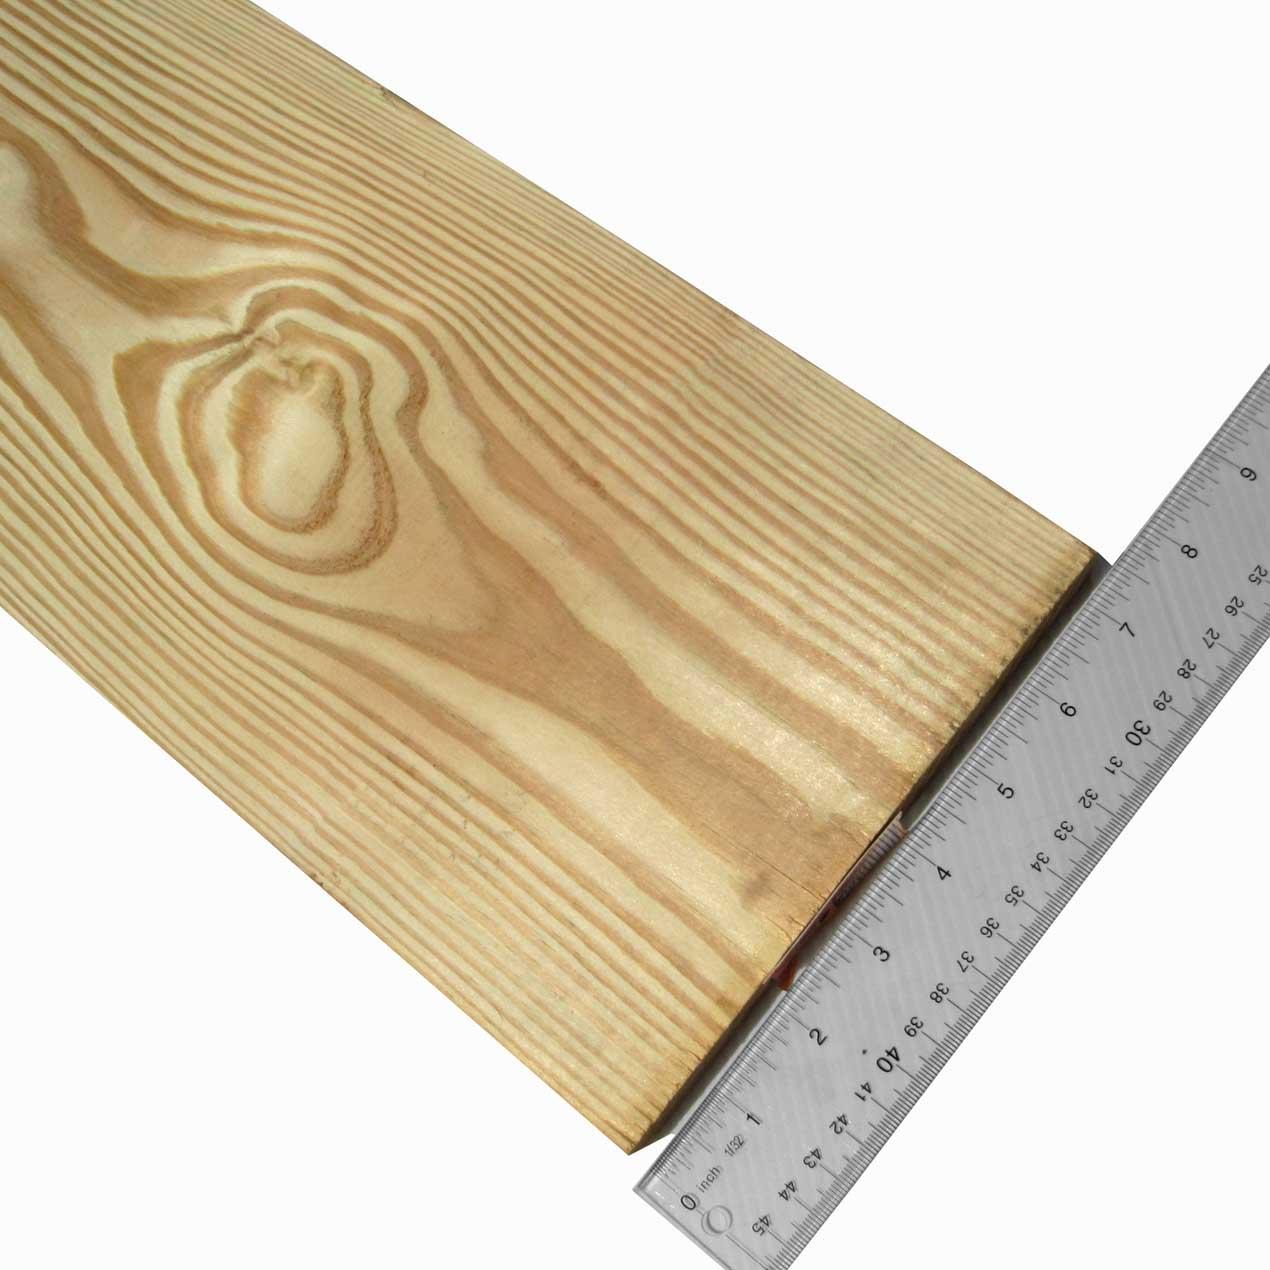 1x8 Culpeper Dry Treated Lumber D Better Capitol City Lumber